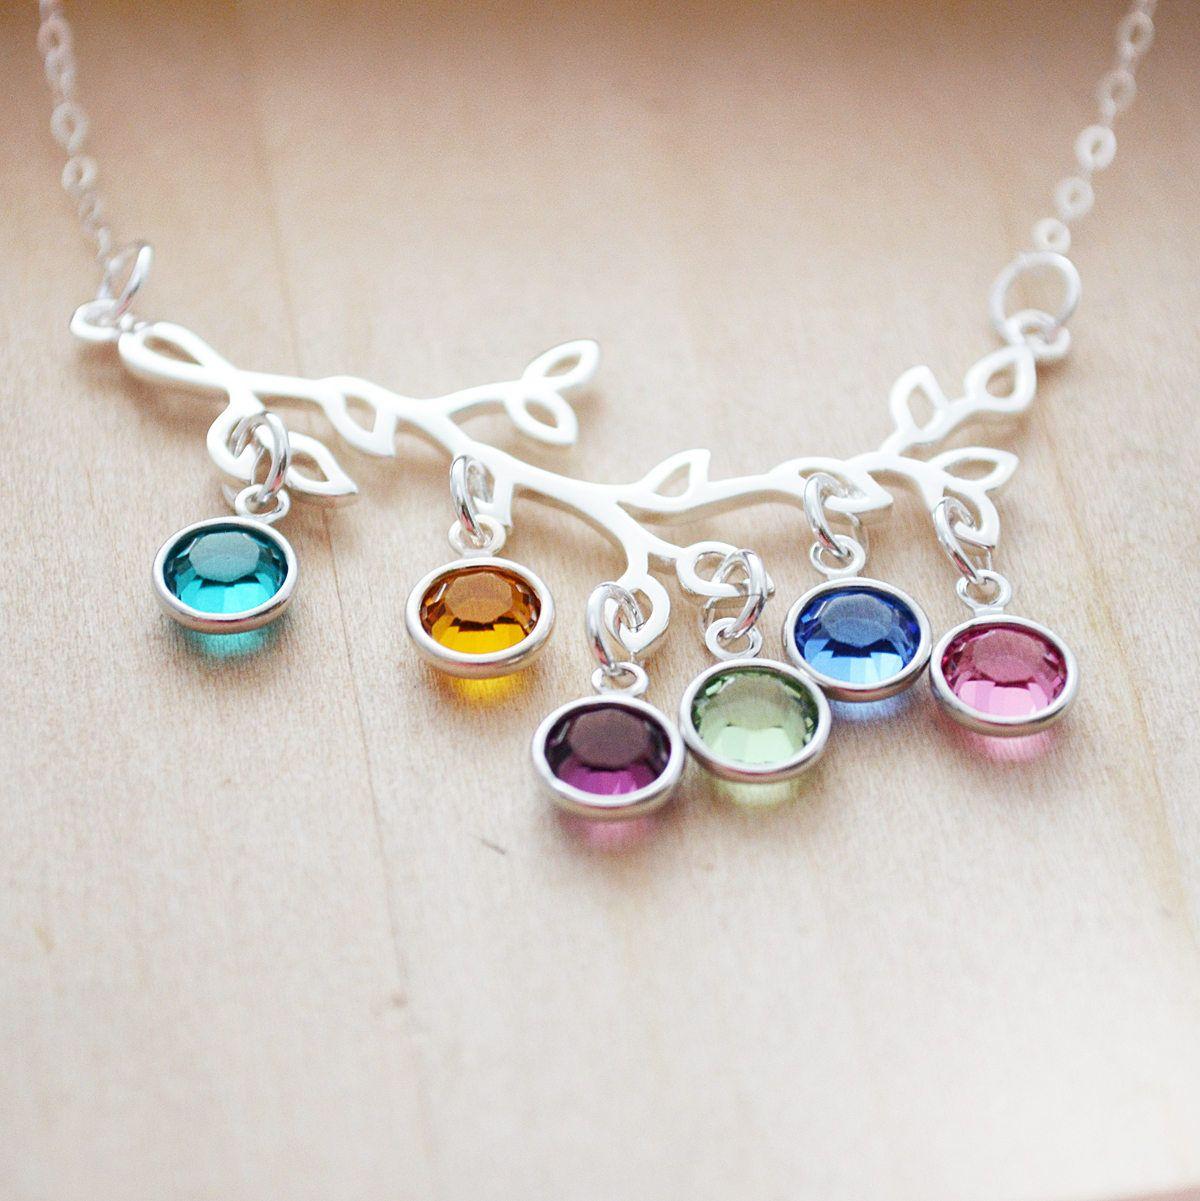 Birthstone Necklace For Mom Grandma - Tree of Life ...